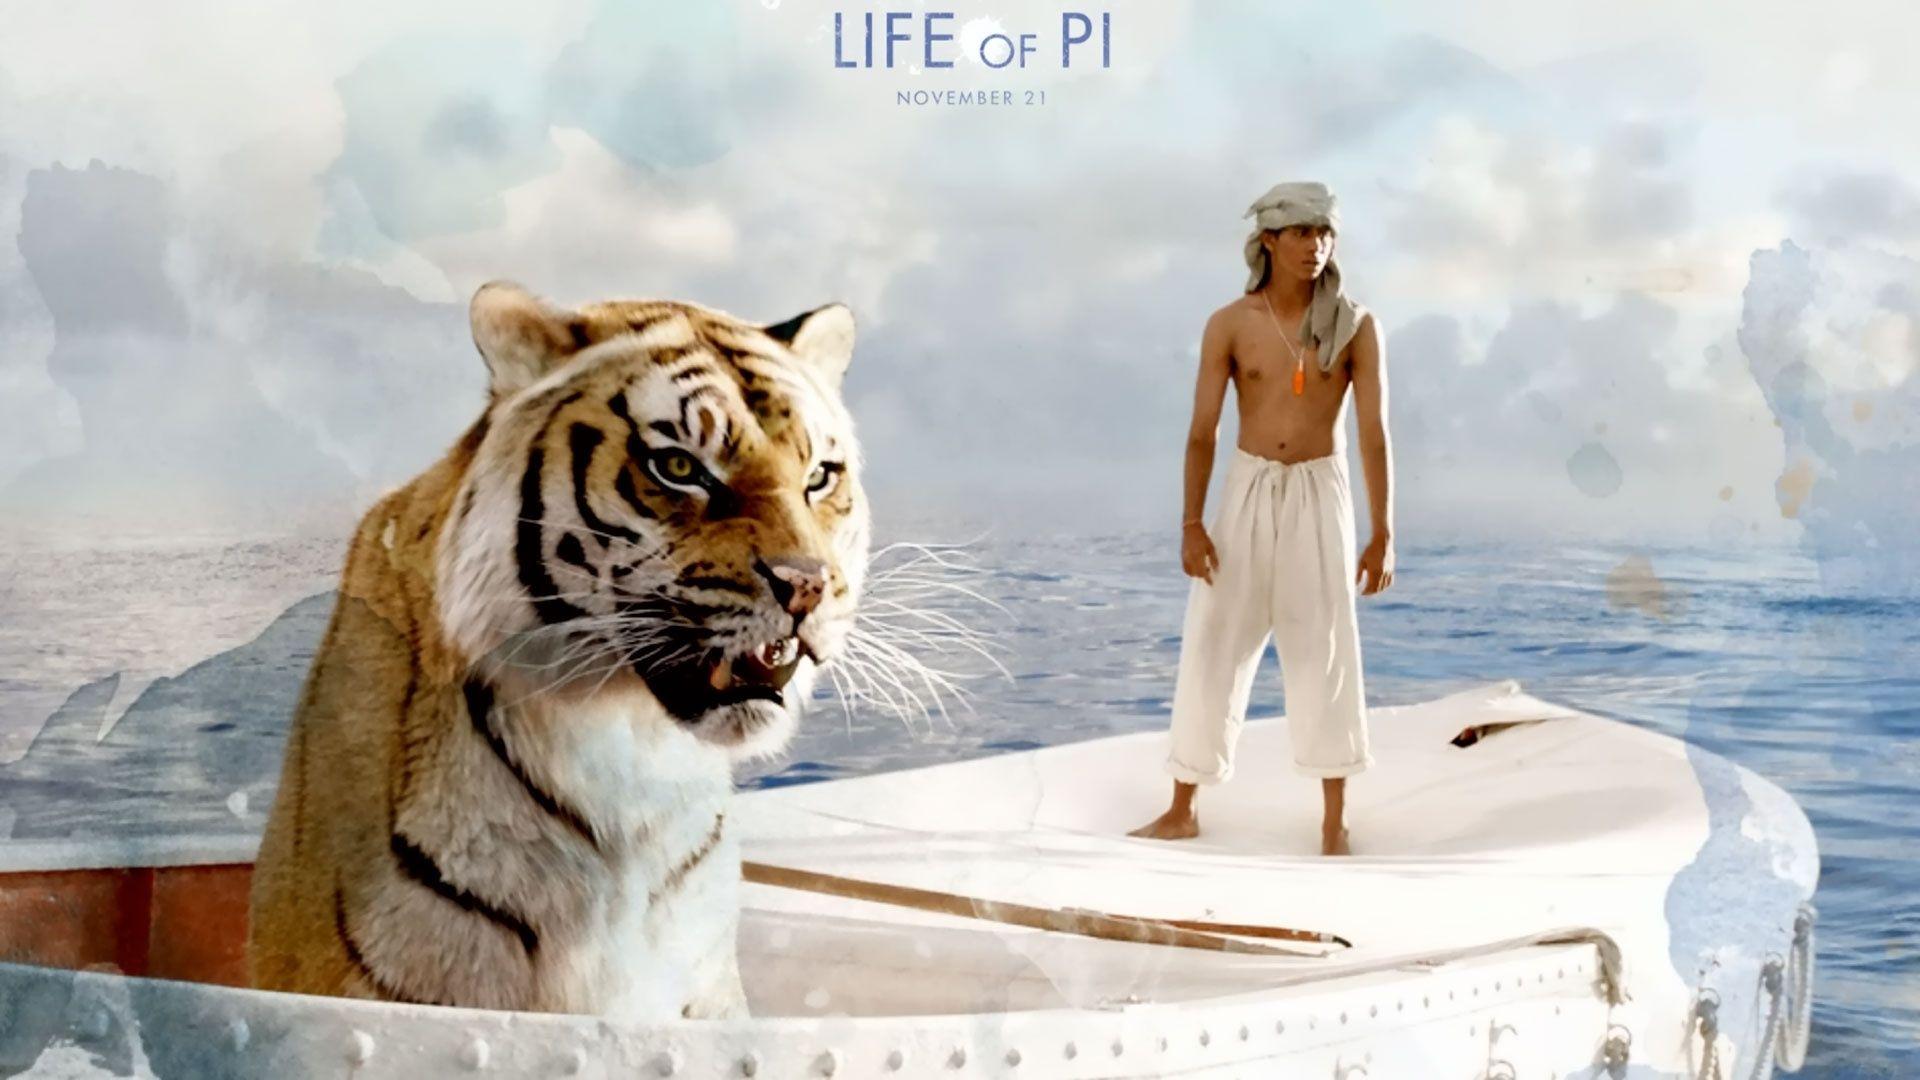 003 Life of Pi now streaming on Netflix New on Netflix